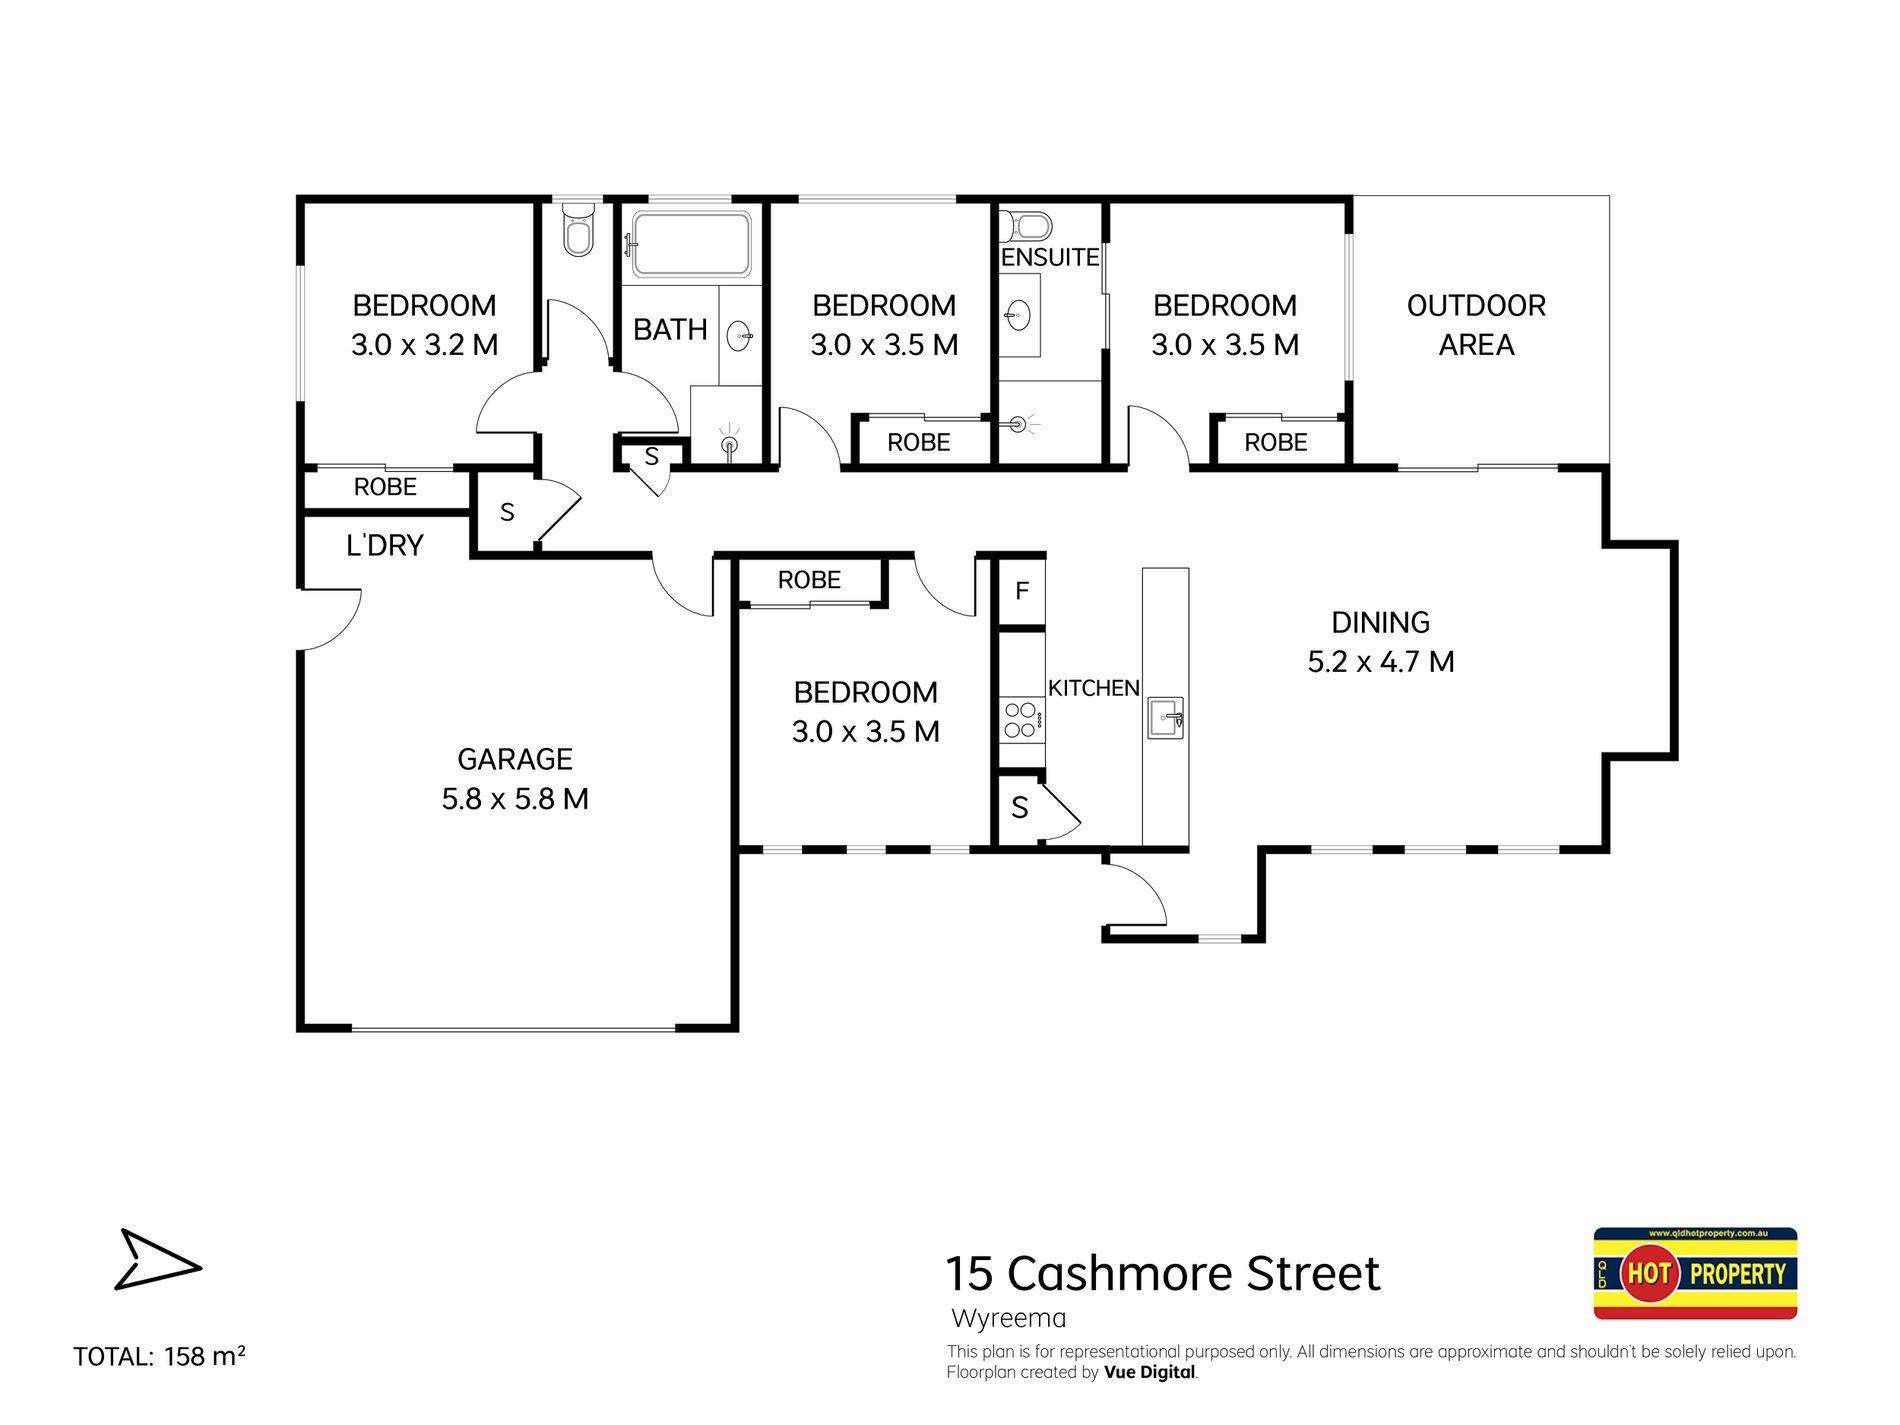 15 Cashmore Street, Wyreema